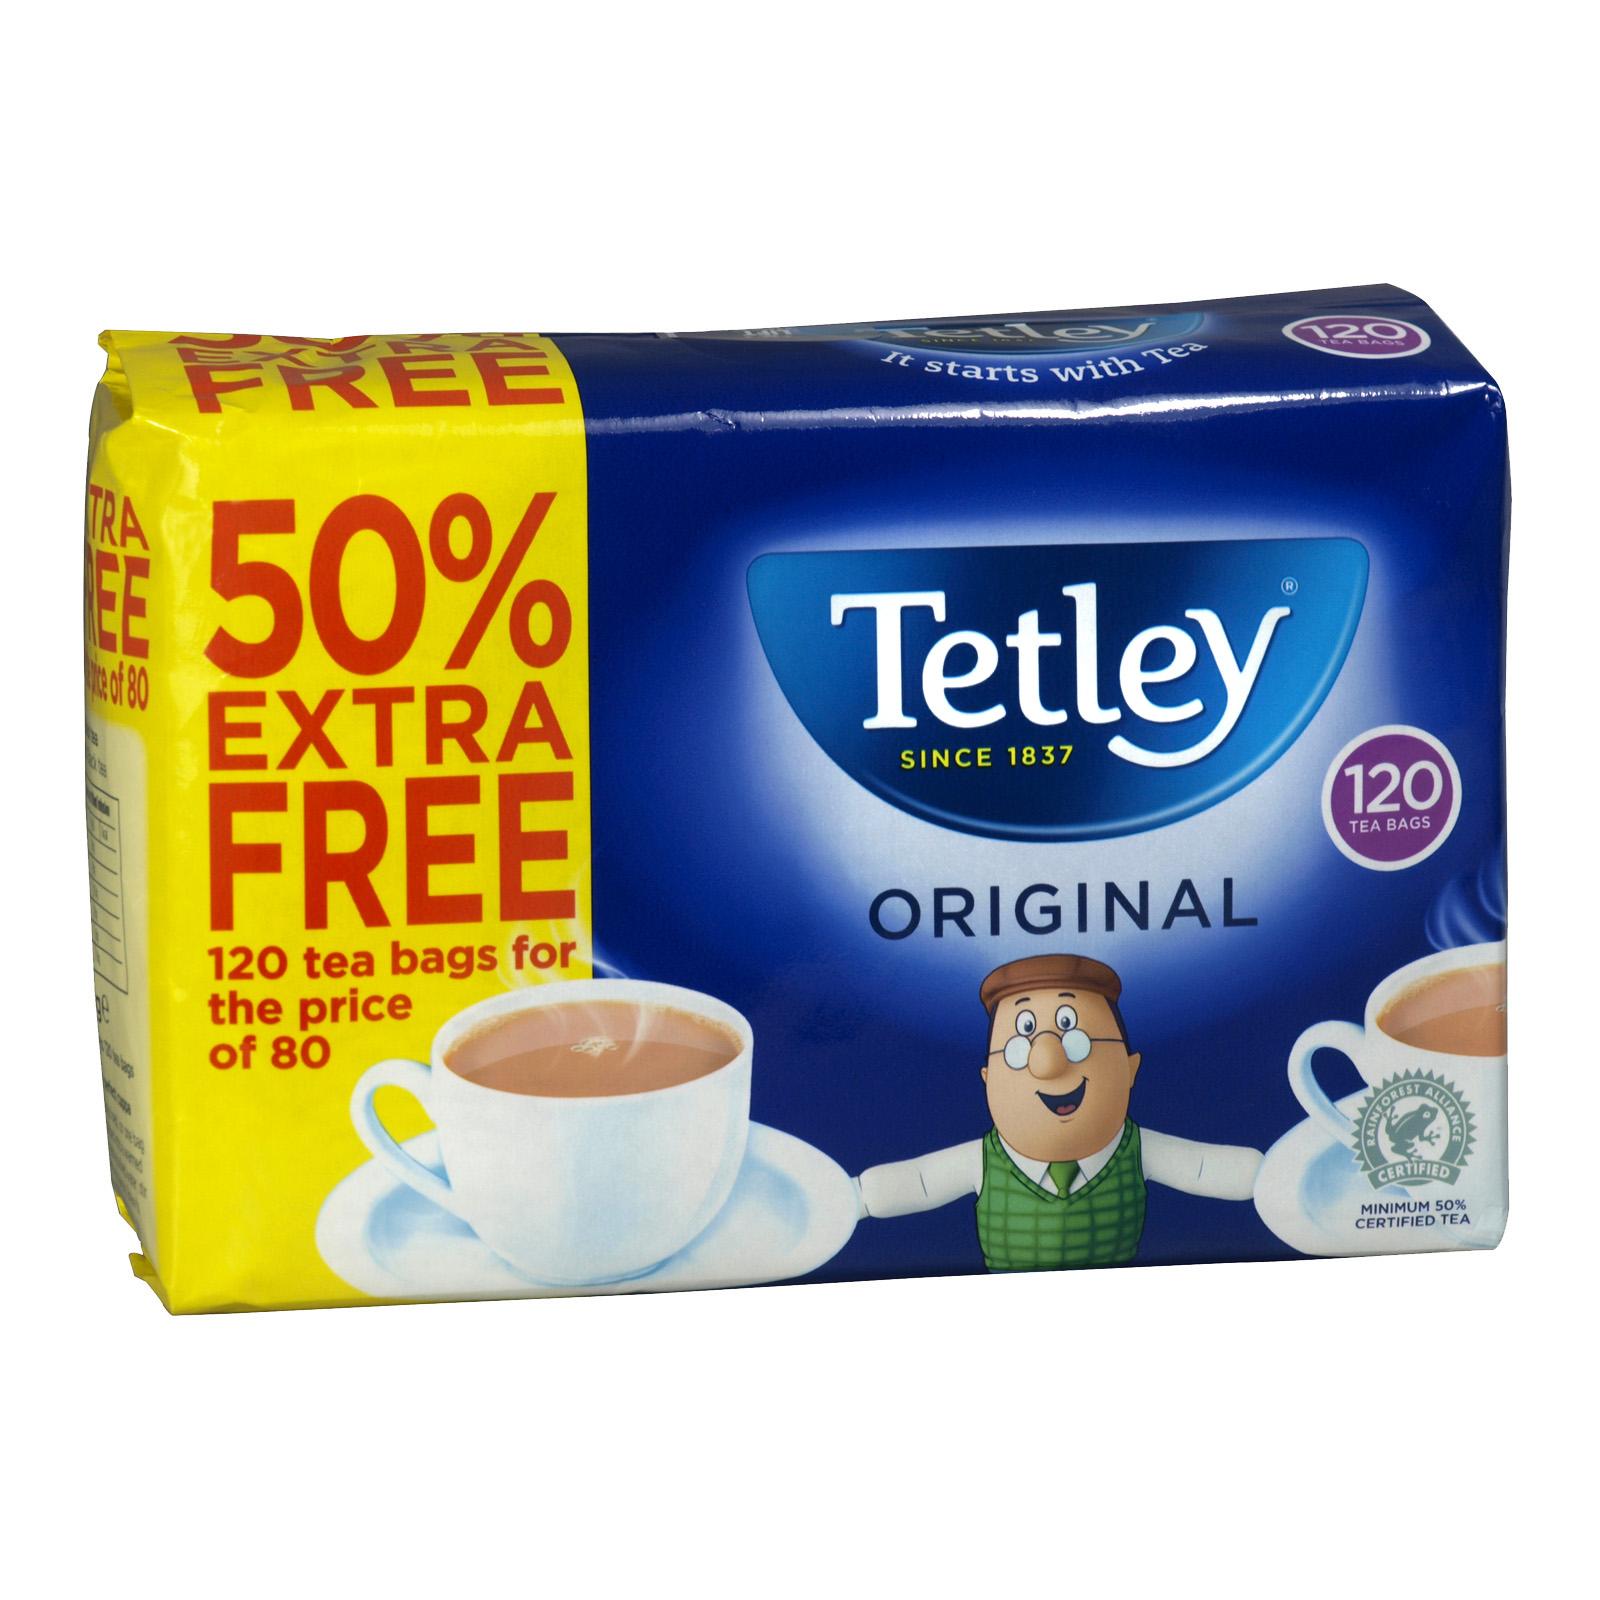 TETLEY 80S + 50% FREE 120 BAGS X12